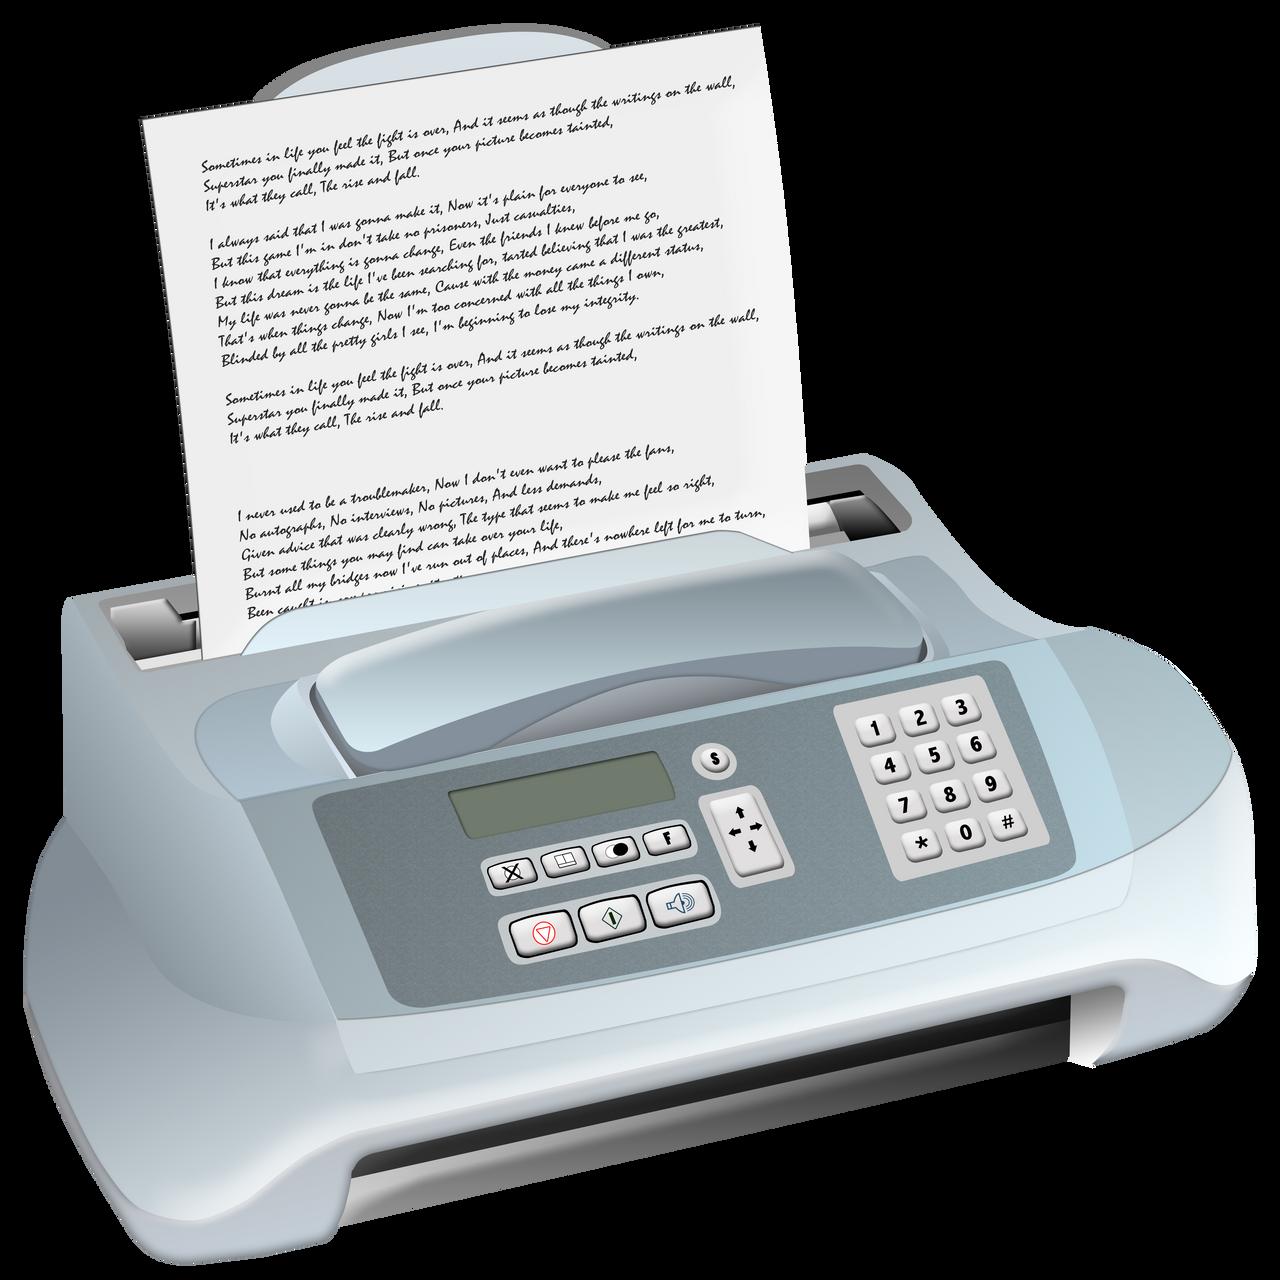 fax by browneyedstorm on deviantart